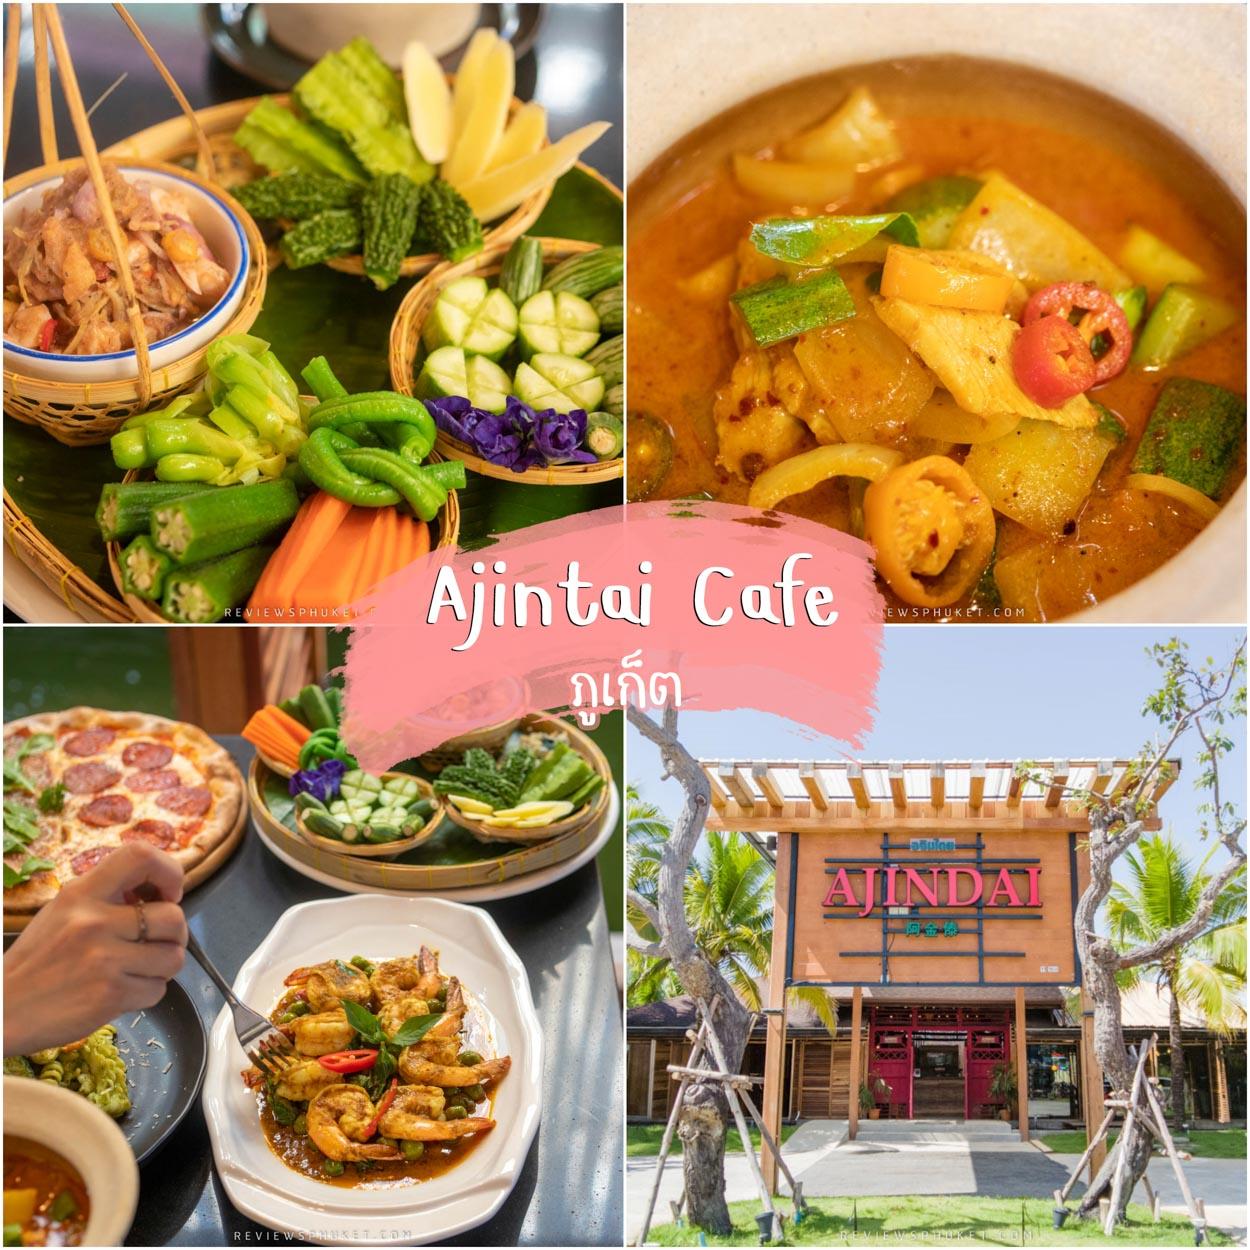 Ajindai Floating Cafe ที่สุดแห่งร้านอาหารสไตล์ฟิวชั่น แห่งภูเก็ต บอกเลยที่นี่มีอาหารหลากหลายมาก